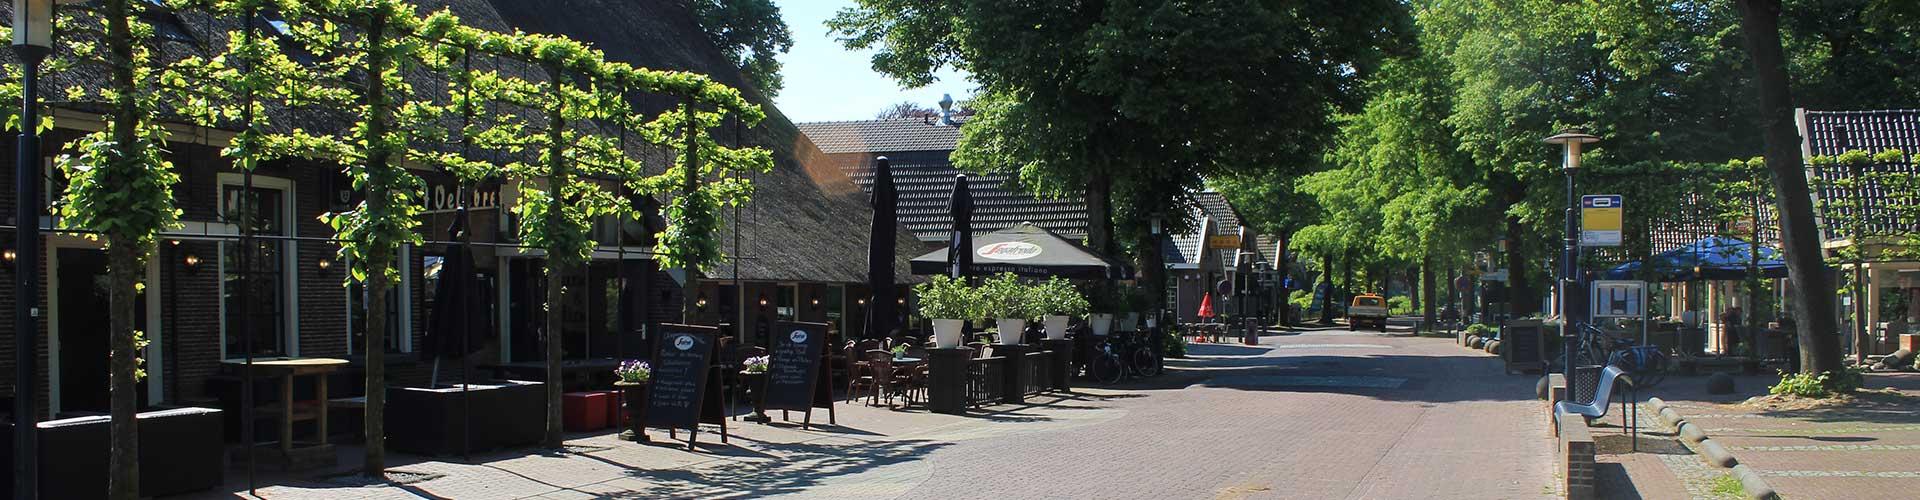 Restaurant 't Oelnbret Dalen